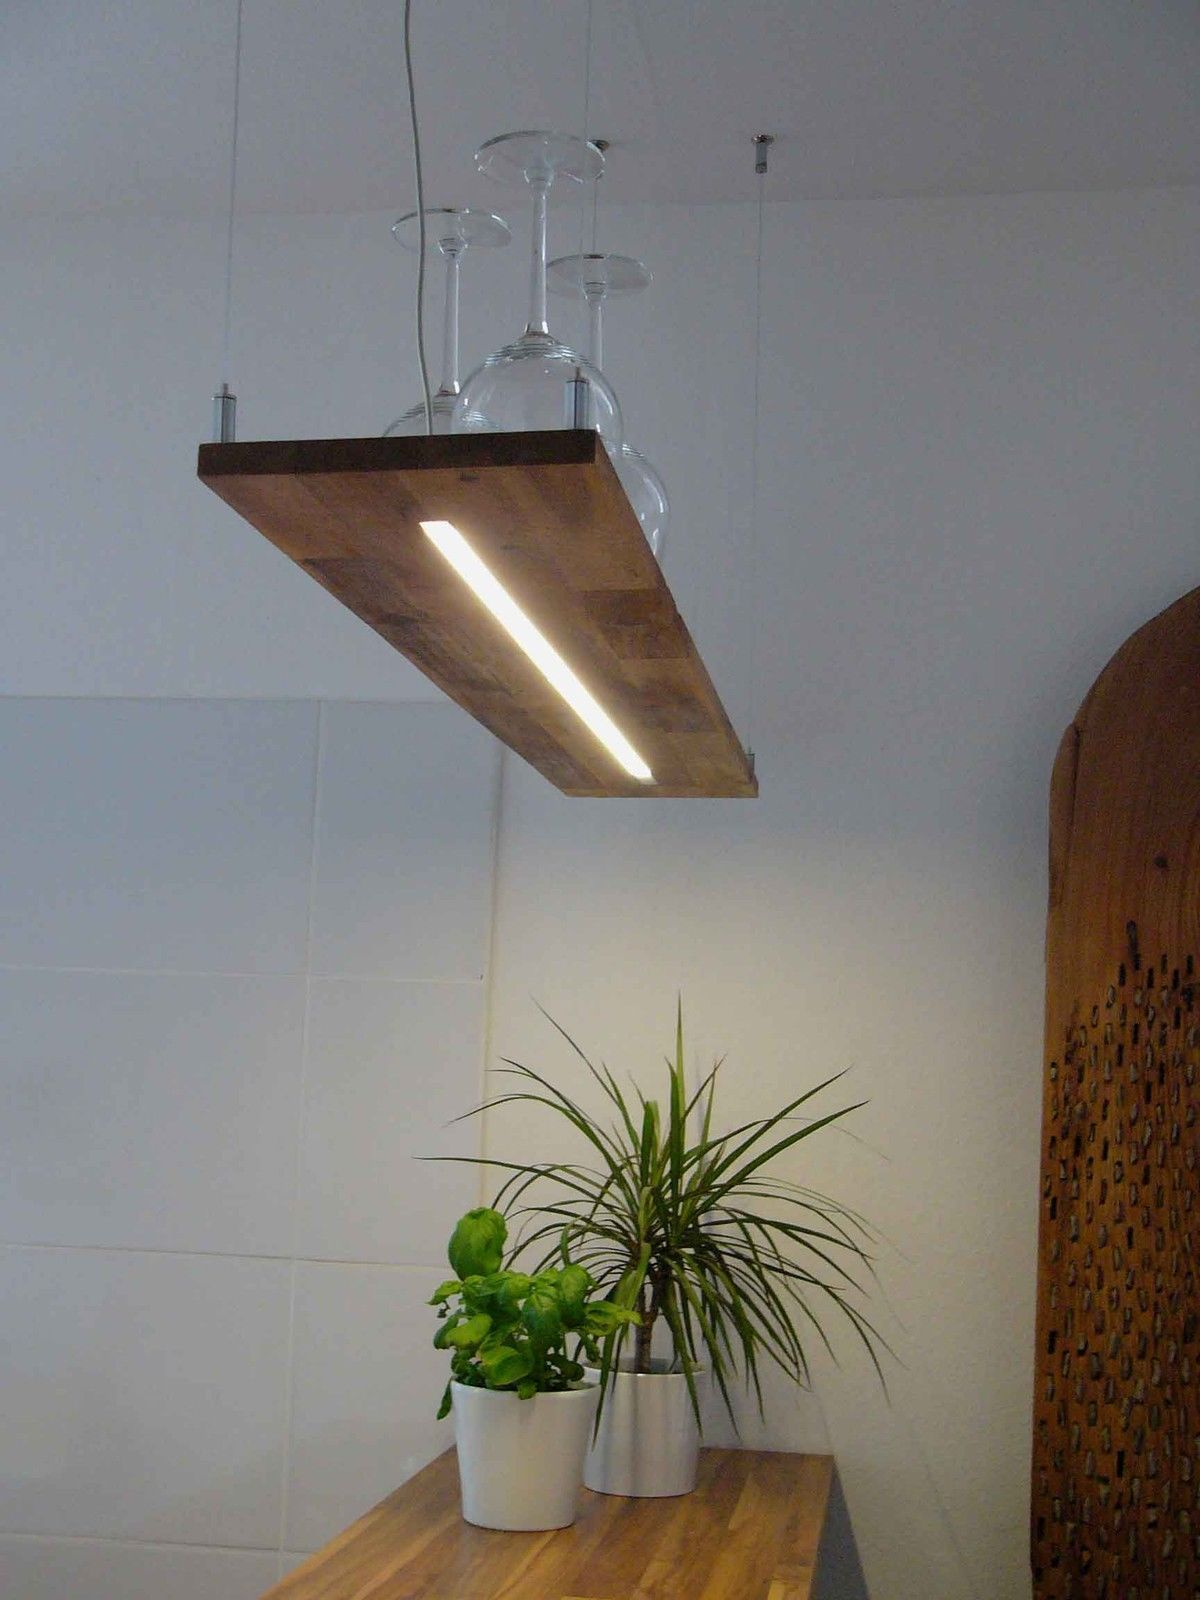 8c0c29fb0039dca428bfb9005c377458 Faszinierend Up Down Lampe Dekorationen